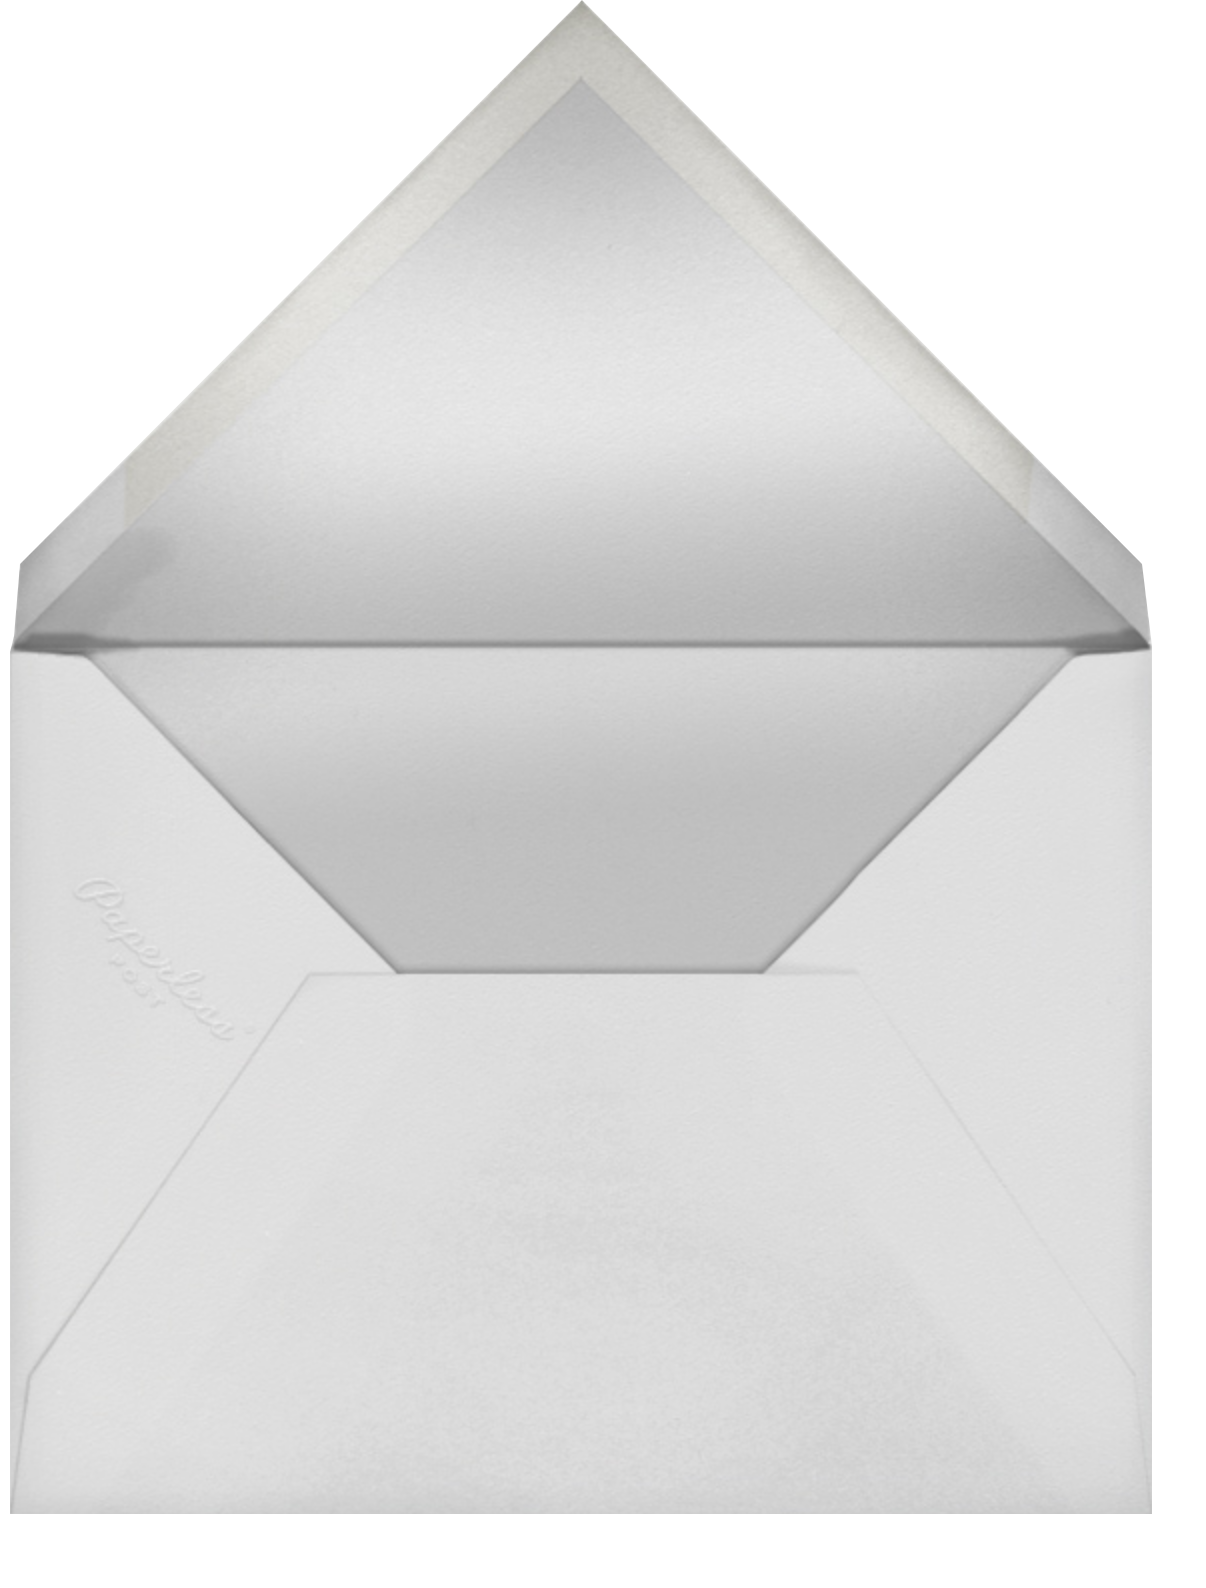 Medium Format Film - Paperless Post - Envelope